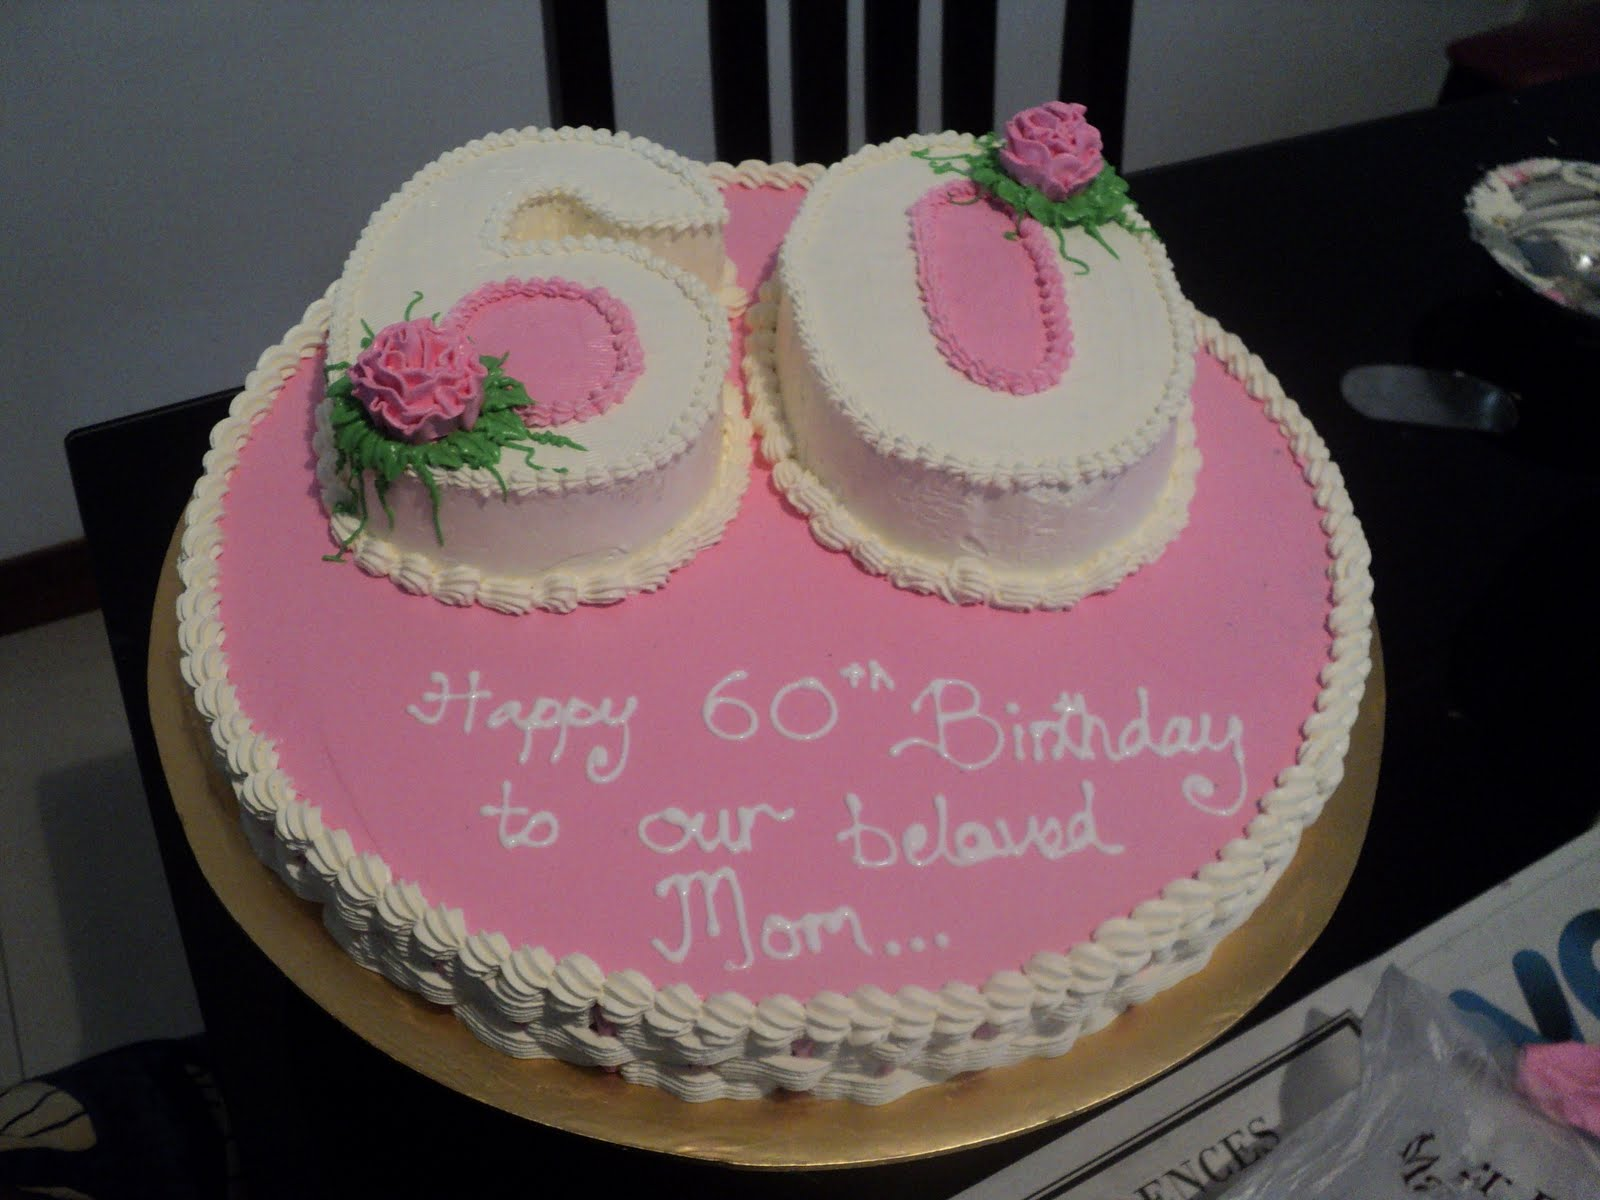 Phenomenal 60Th Birthday Quotes Cake Quotesgram Funny Birthday Cards Online Bapapcheapnameinfo